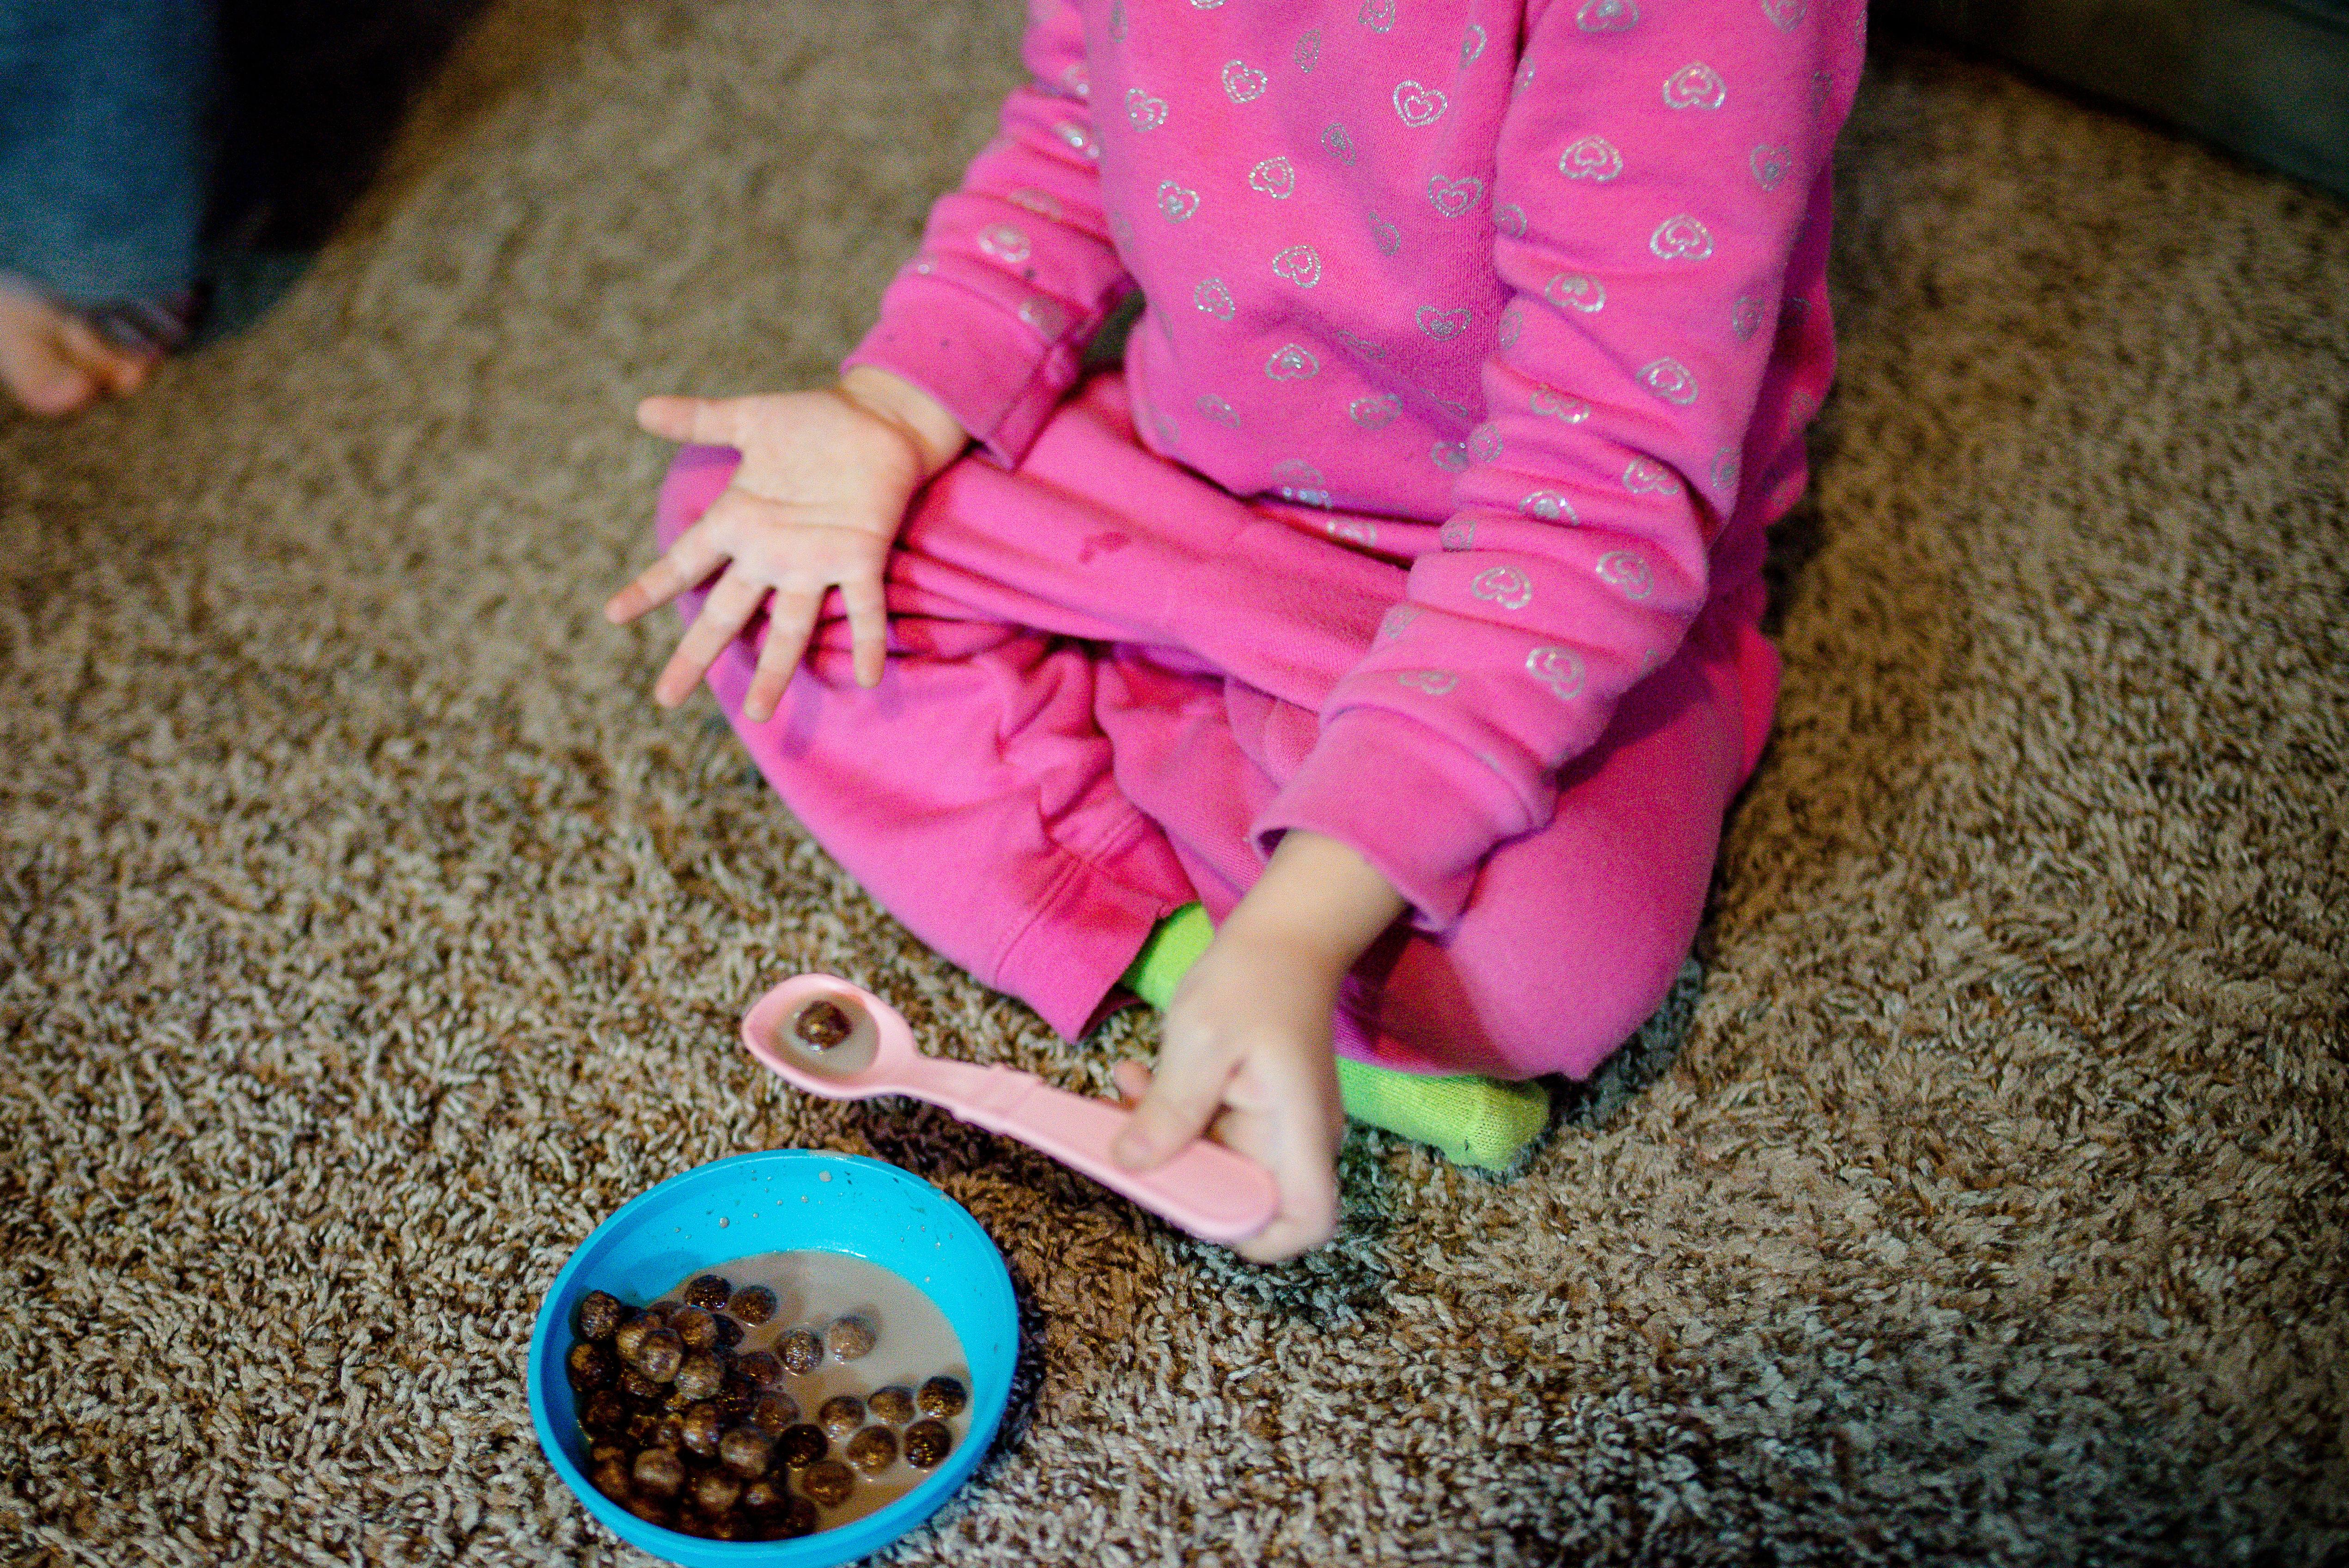 Little girl eats cereal on carpet